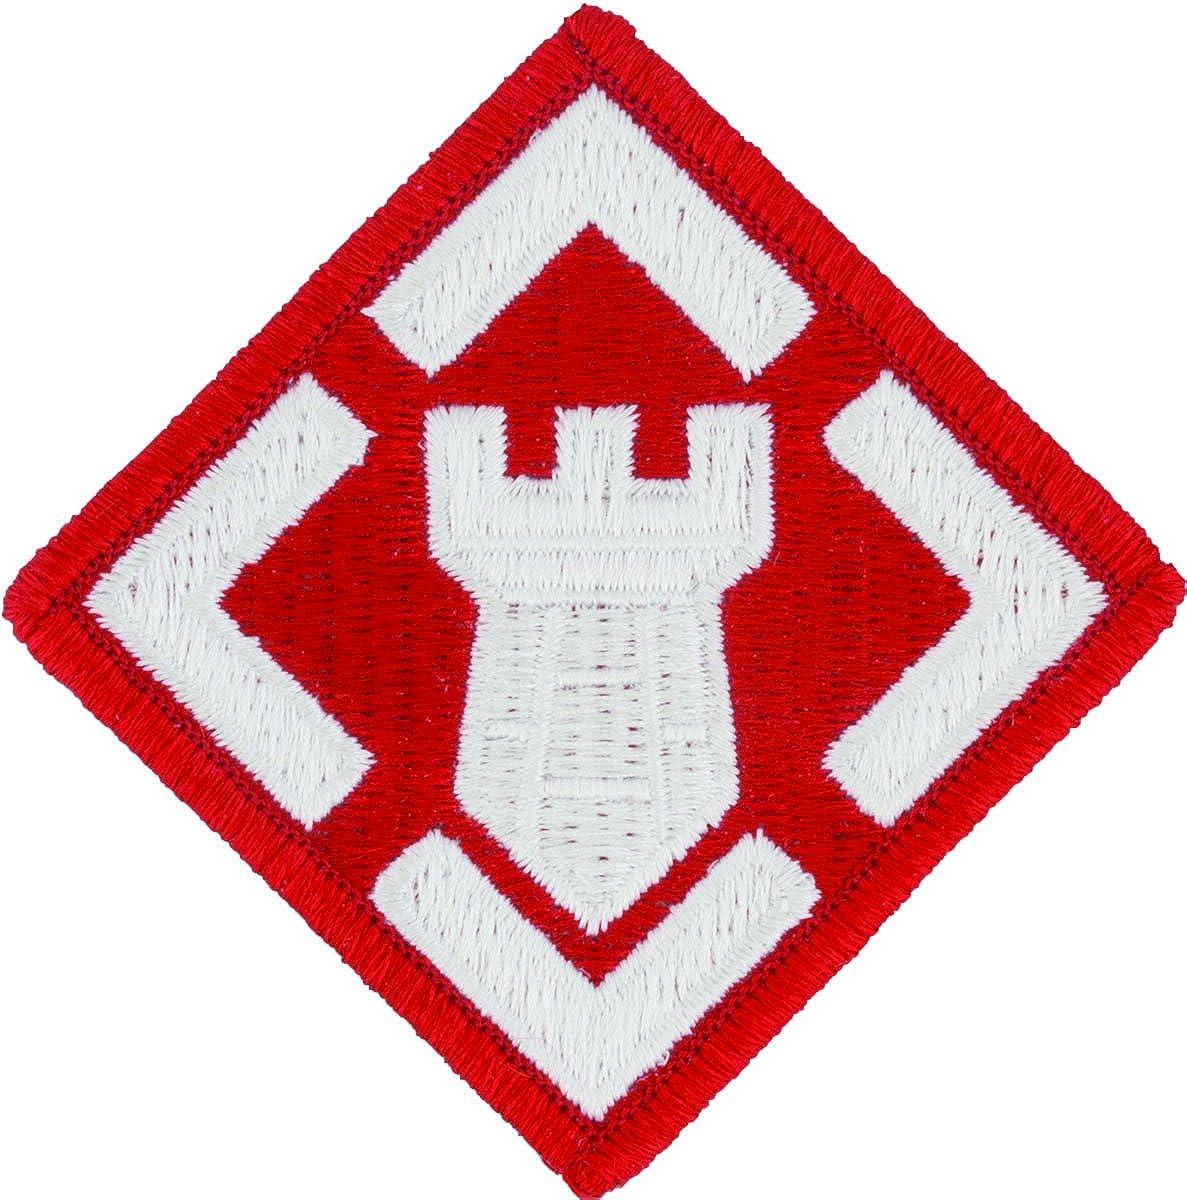 20th Engineer Brigade Patch